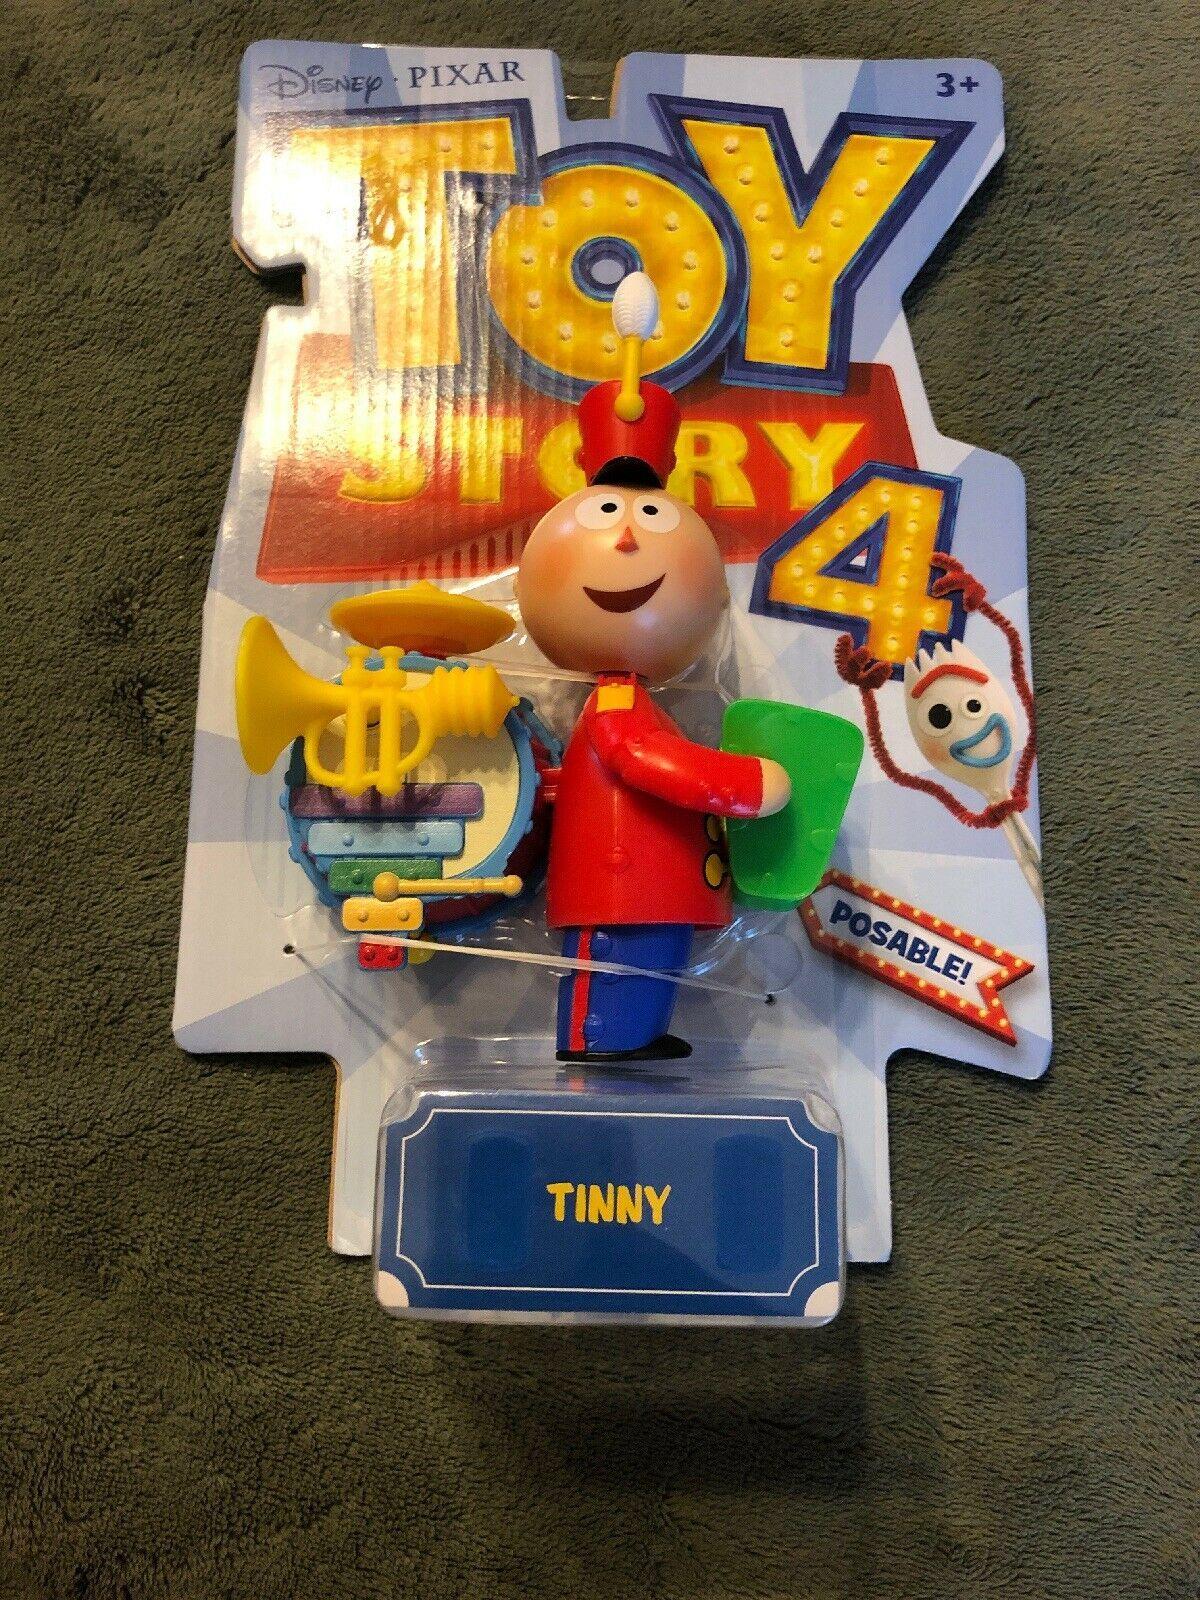 "Toy Story 4 Tinny Figure Disney Pixar 2019 Action Figure Poseable 6"" Inch"